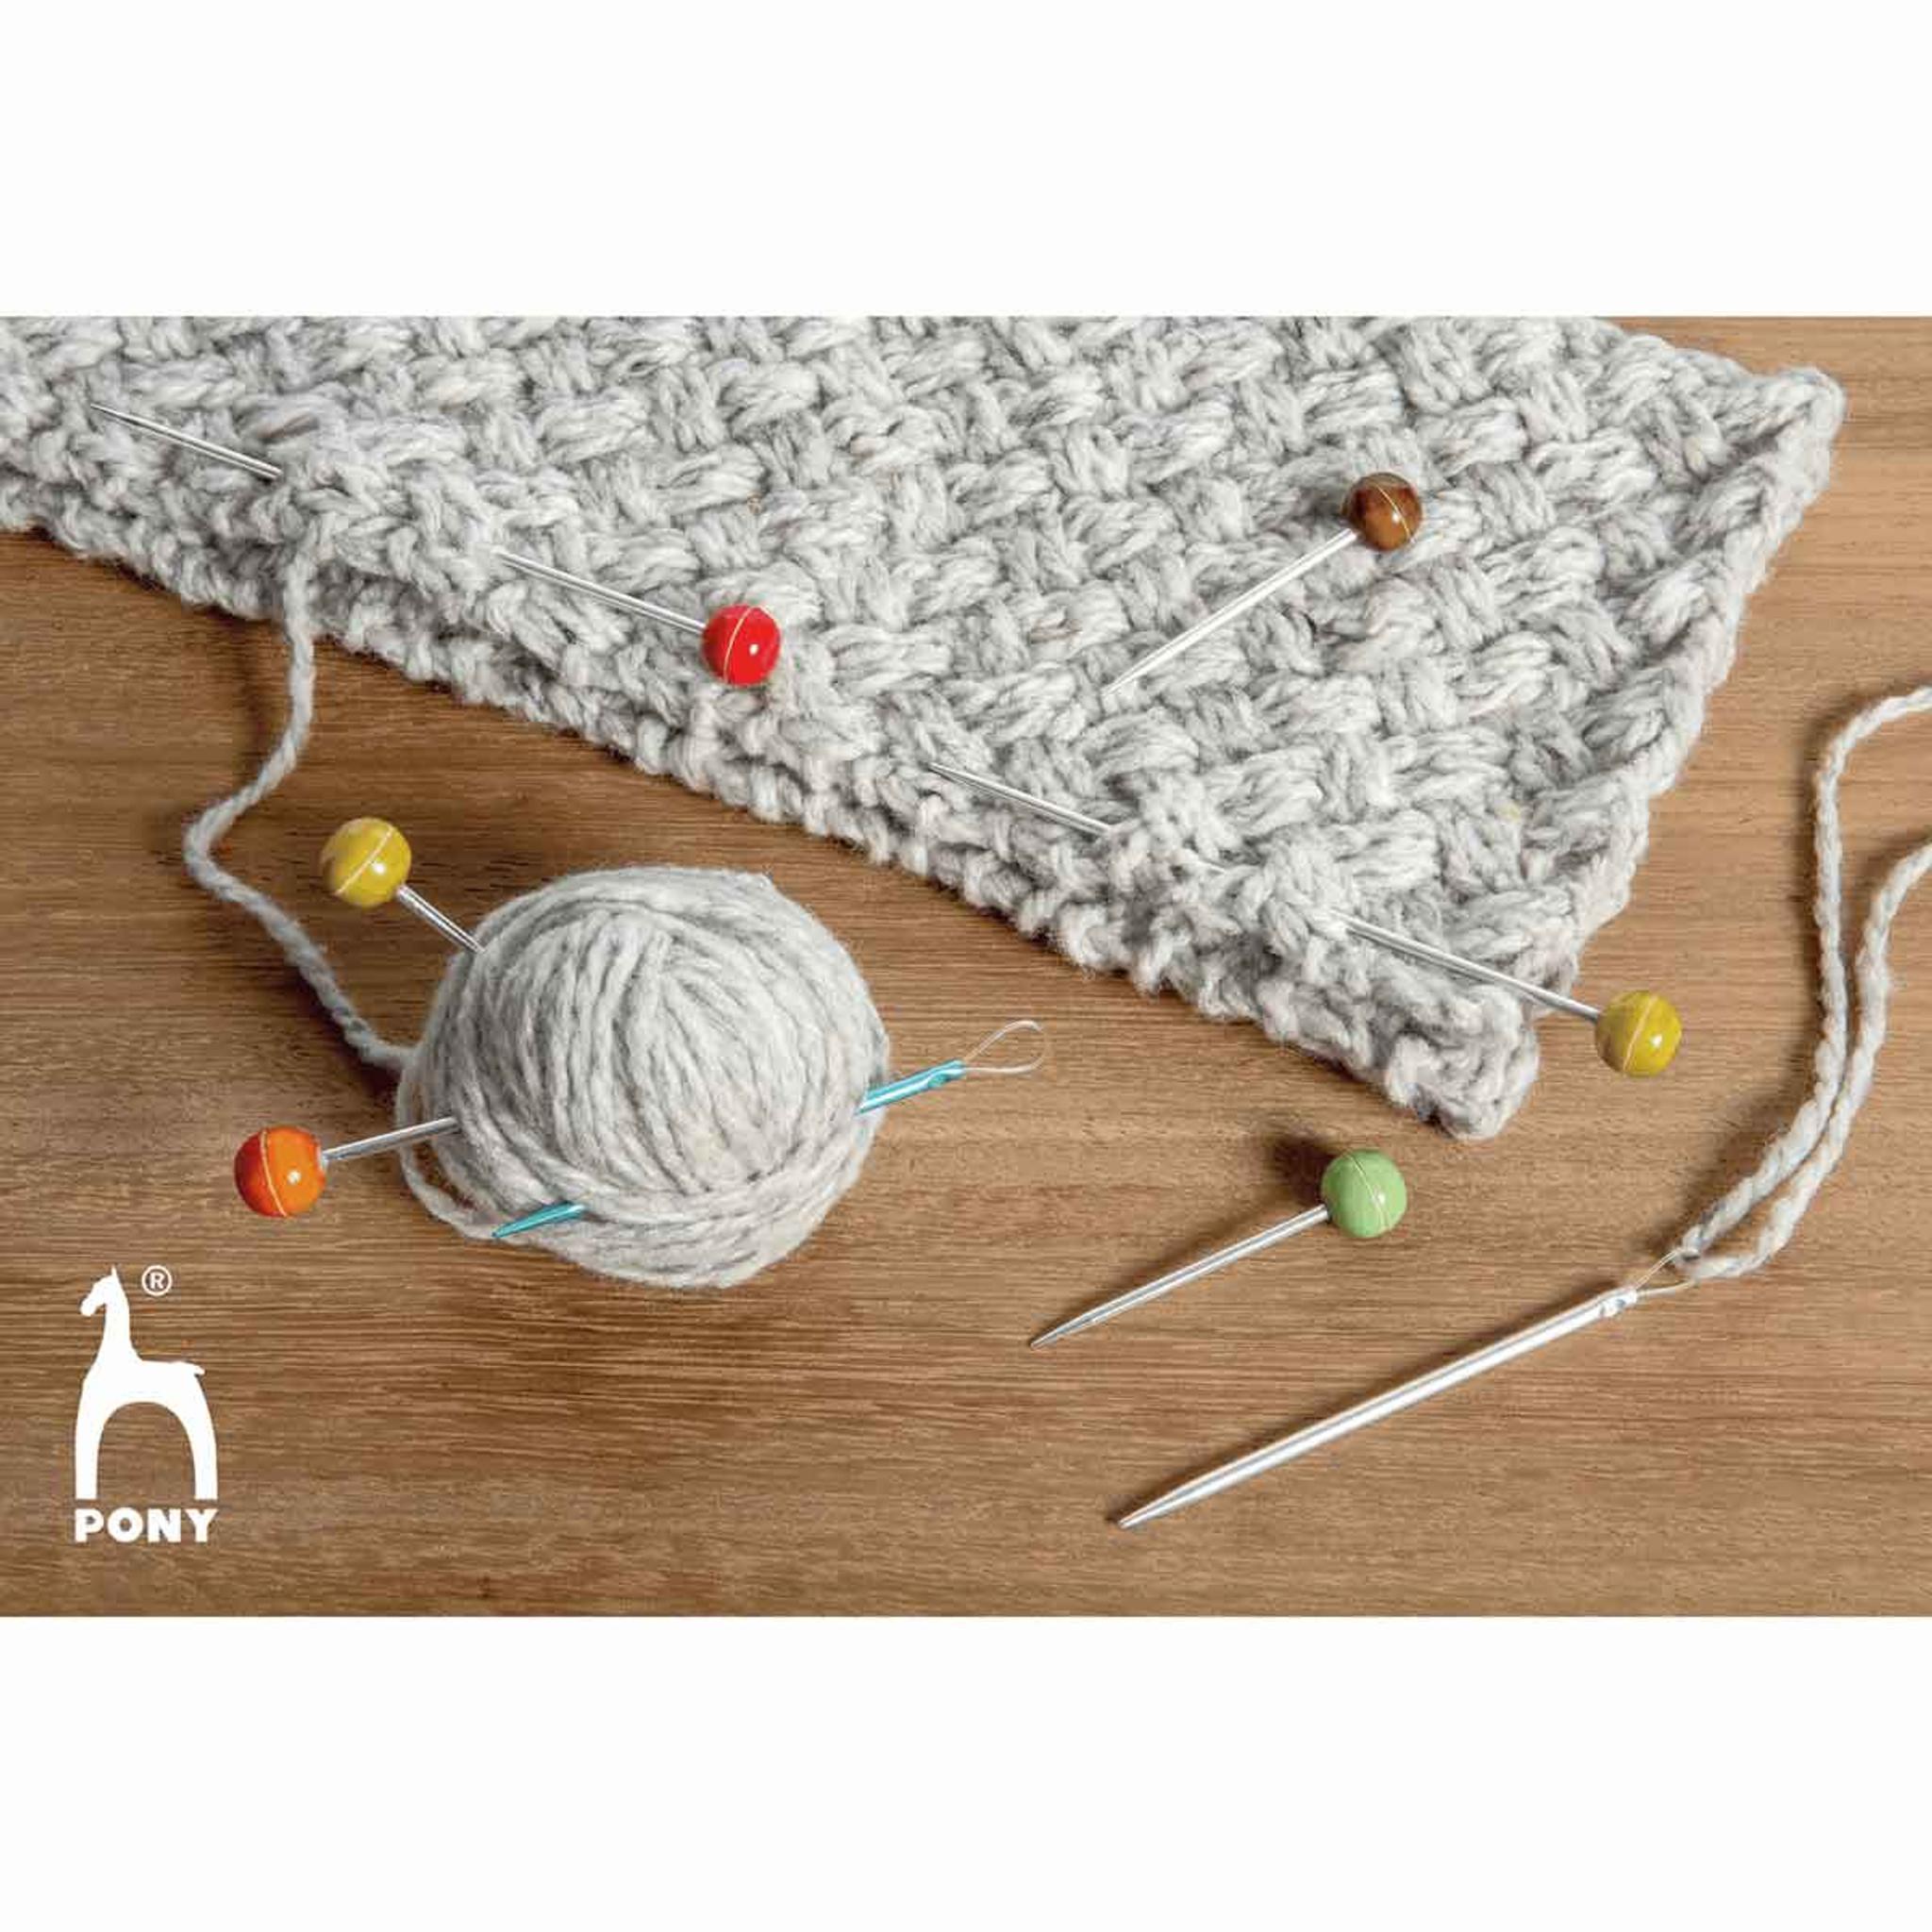 Pony Stitch Holders Knitting Needles Knit Pin Small Medium Large Steel All Sizes